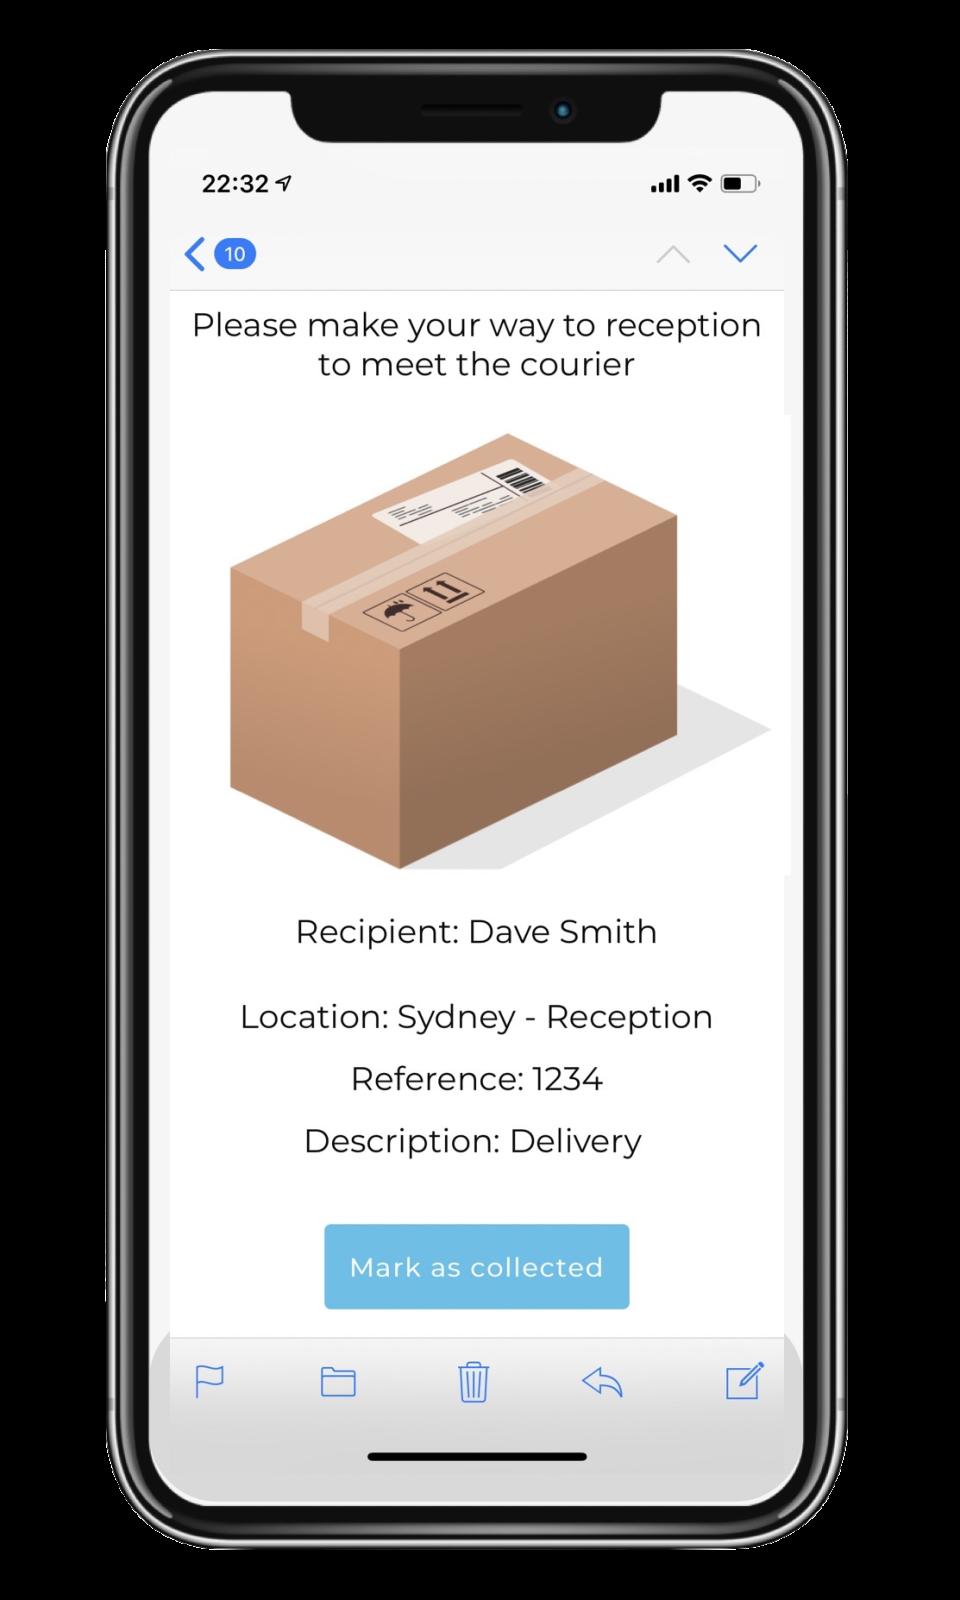 VisitUs Deliveries iOS application